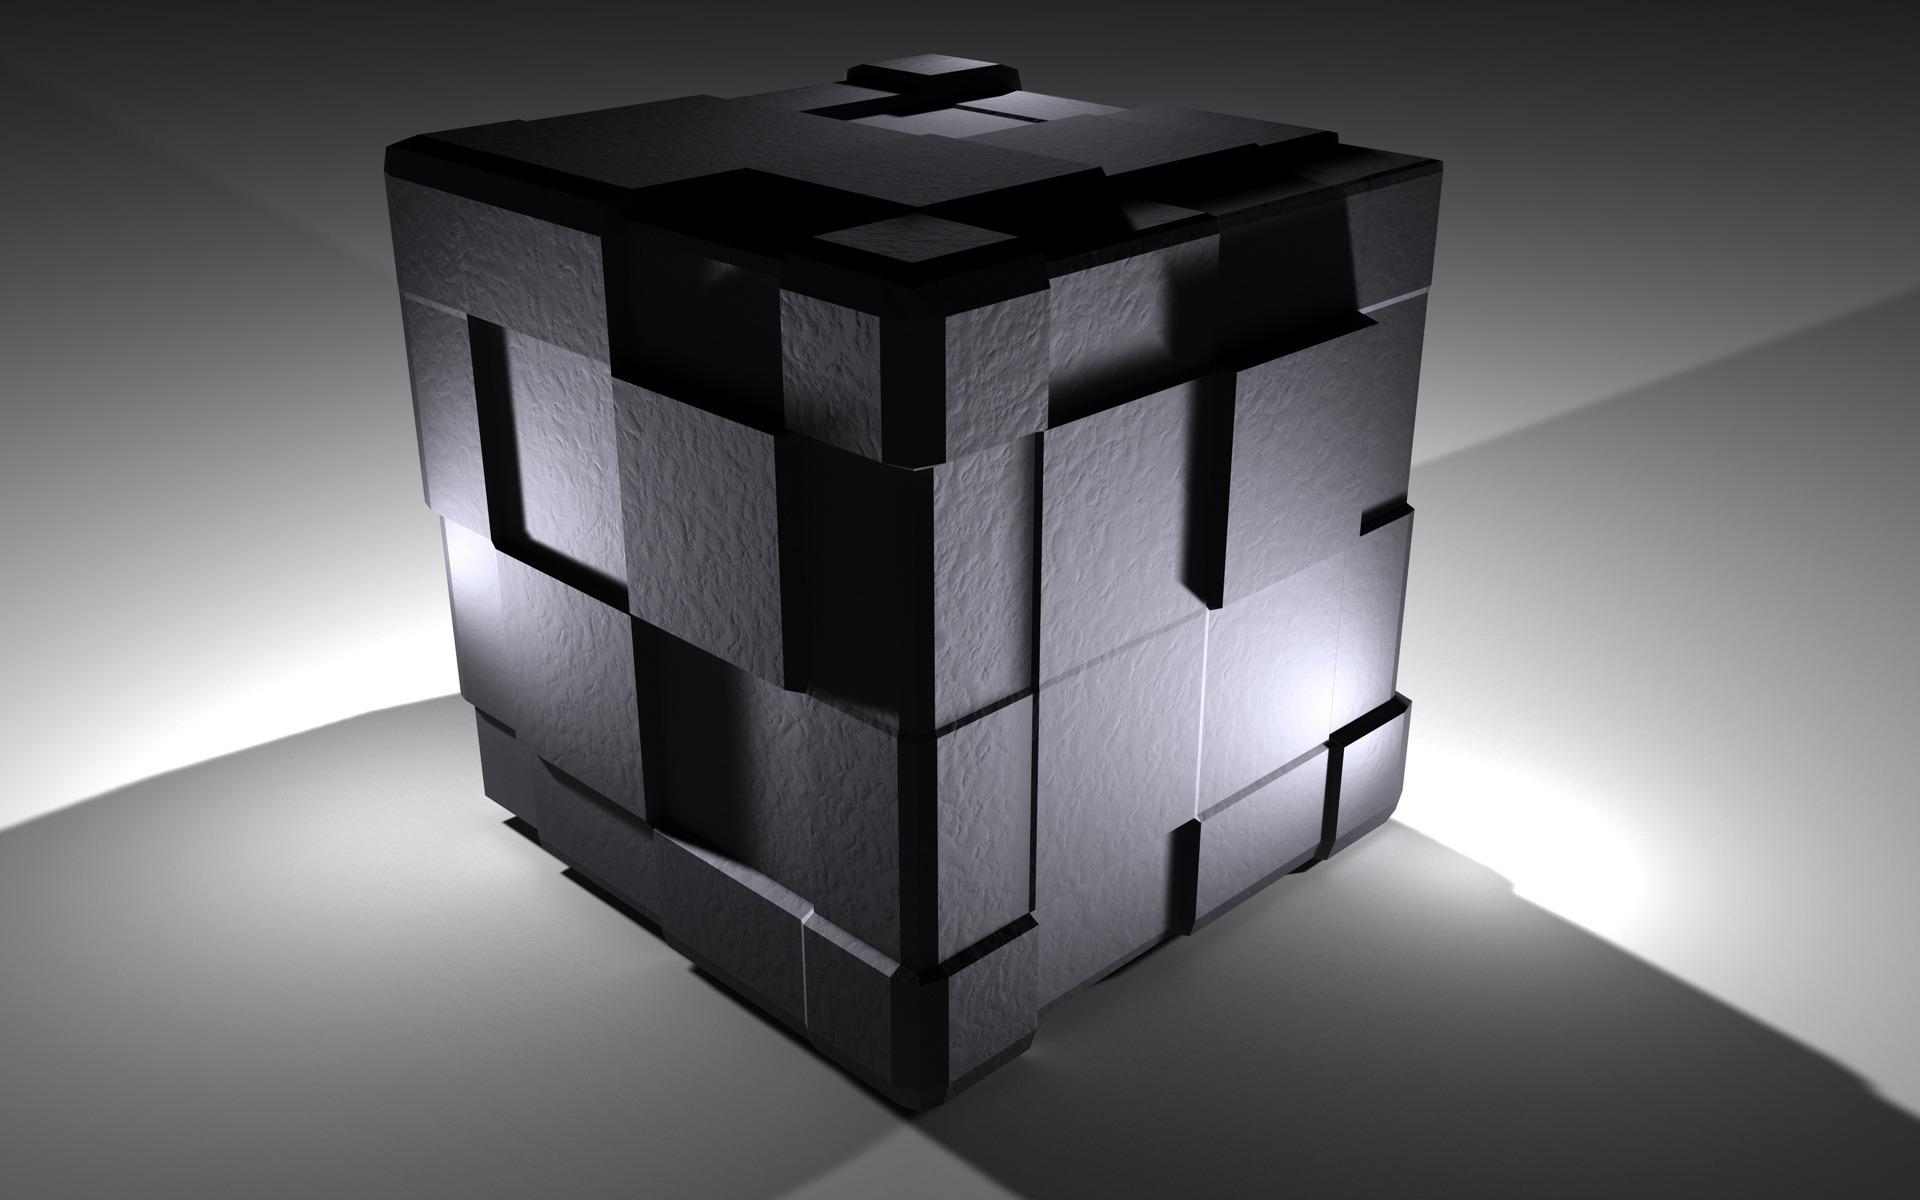 Black Cube Wallpaper 2050 1920 x 1200   WallpaperLayercom 1920x1200